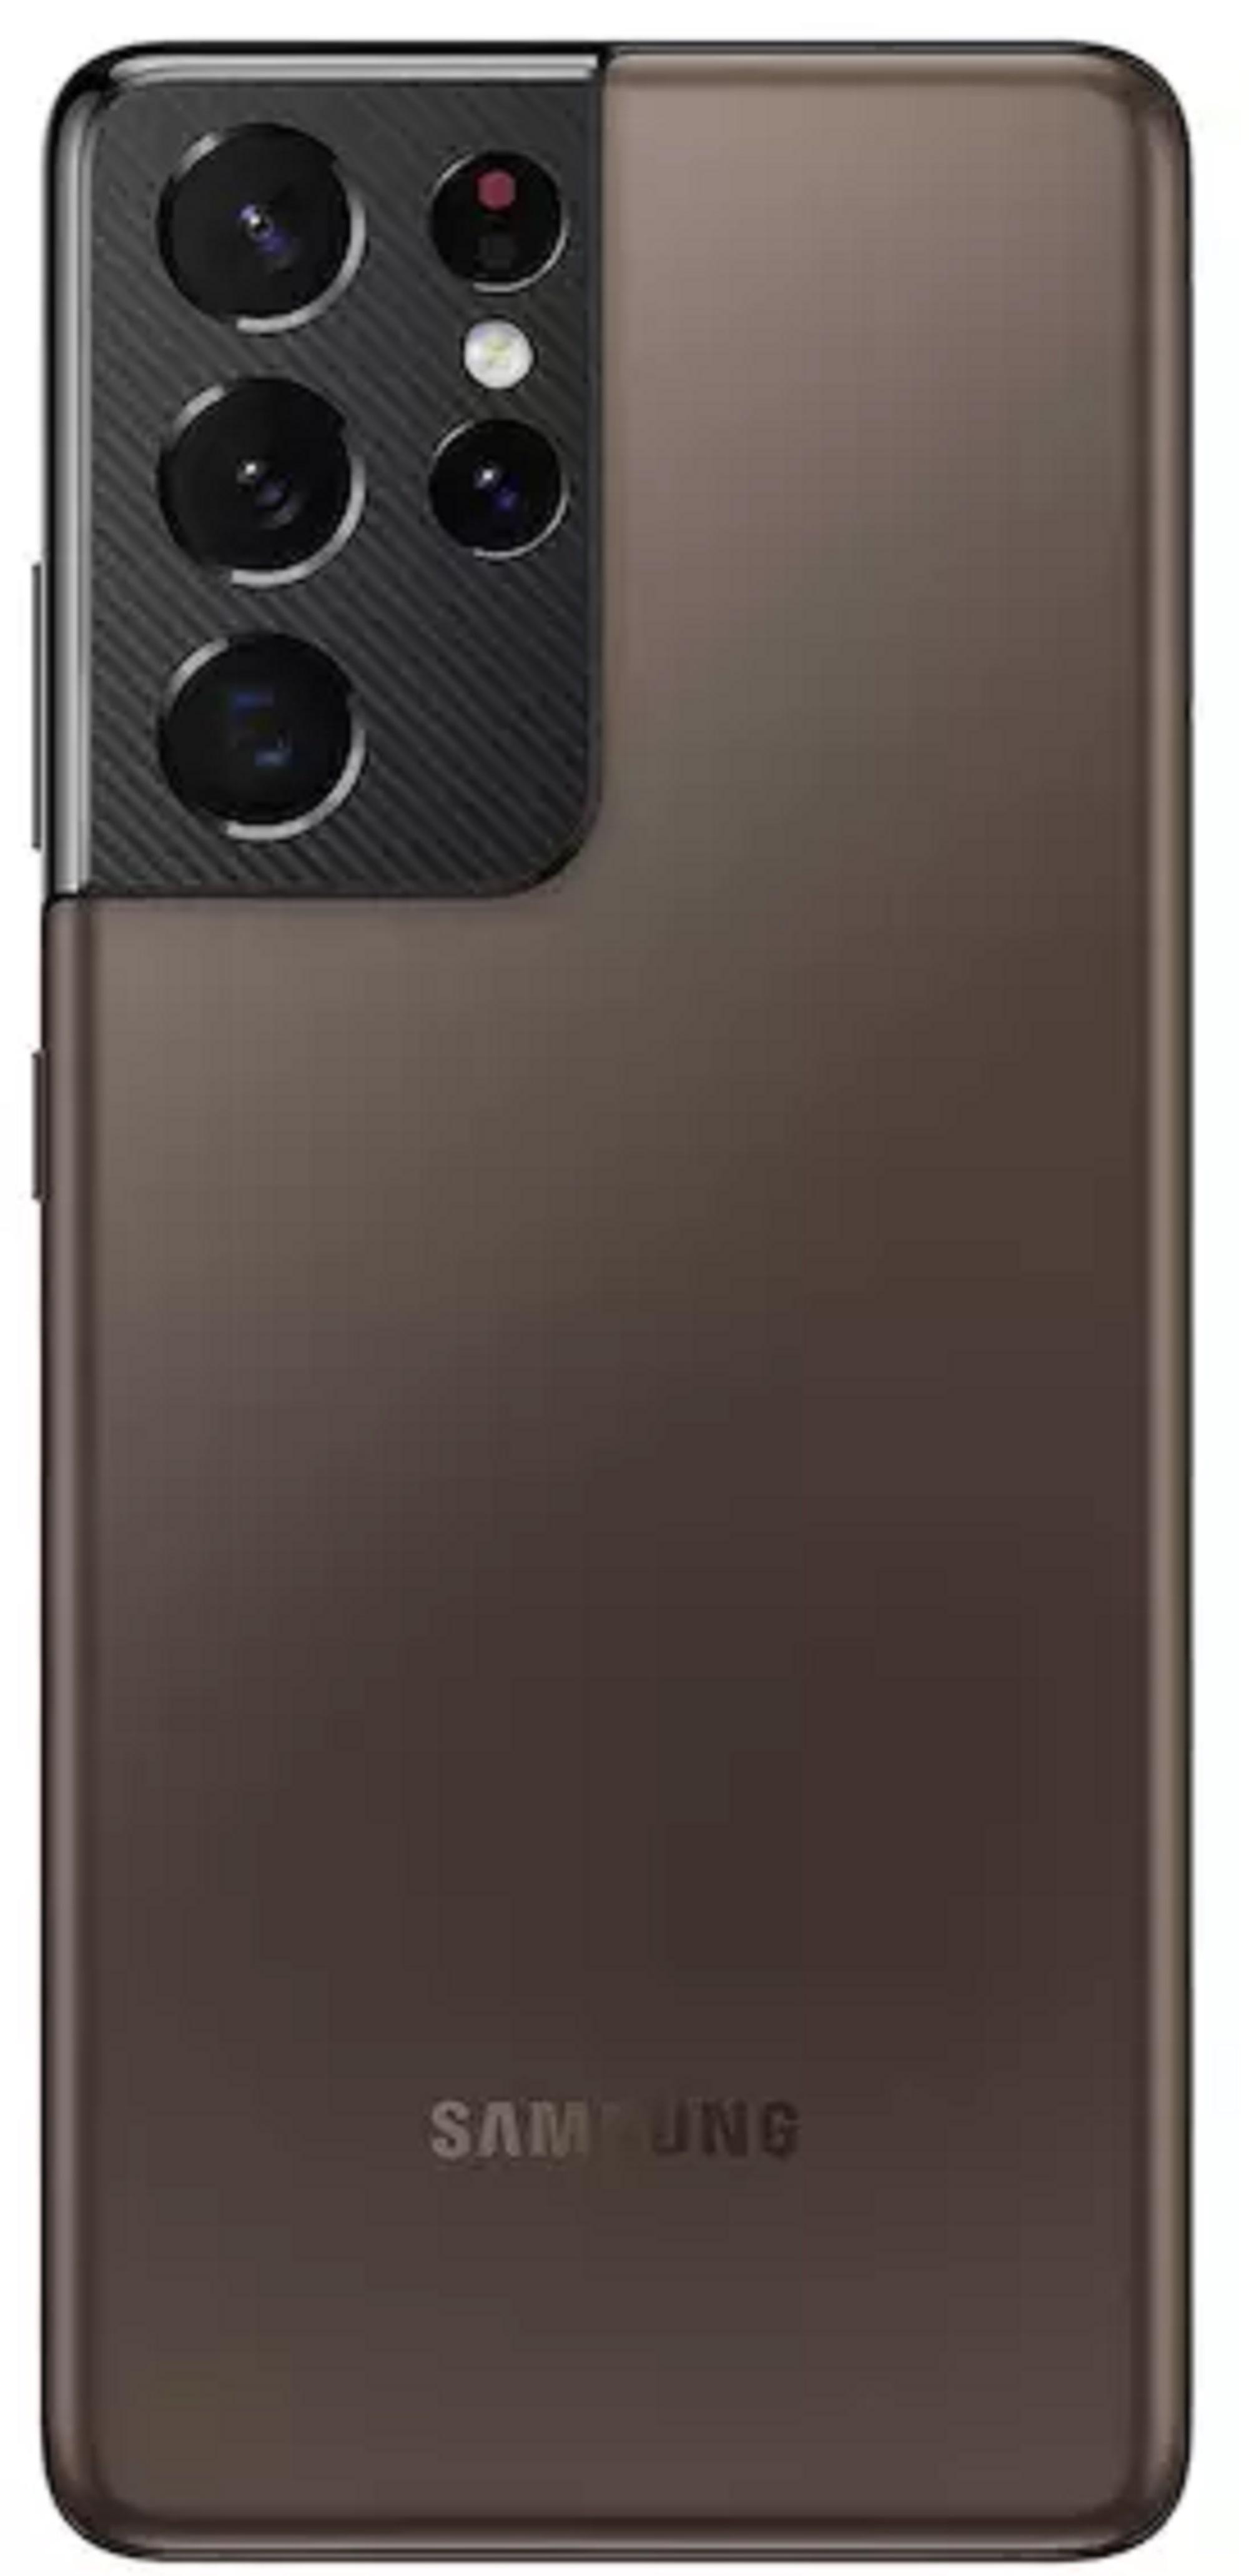 thumbnail 10 - Samsung Galaxy G998U S21 Ultra 5G 128GB Unlocked Smartphone - Excellent